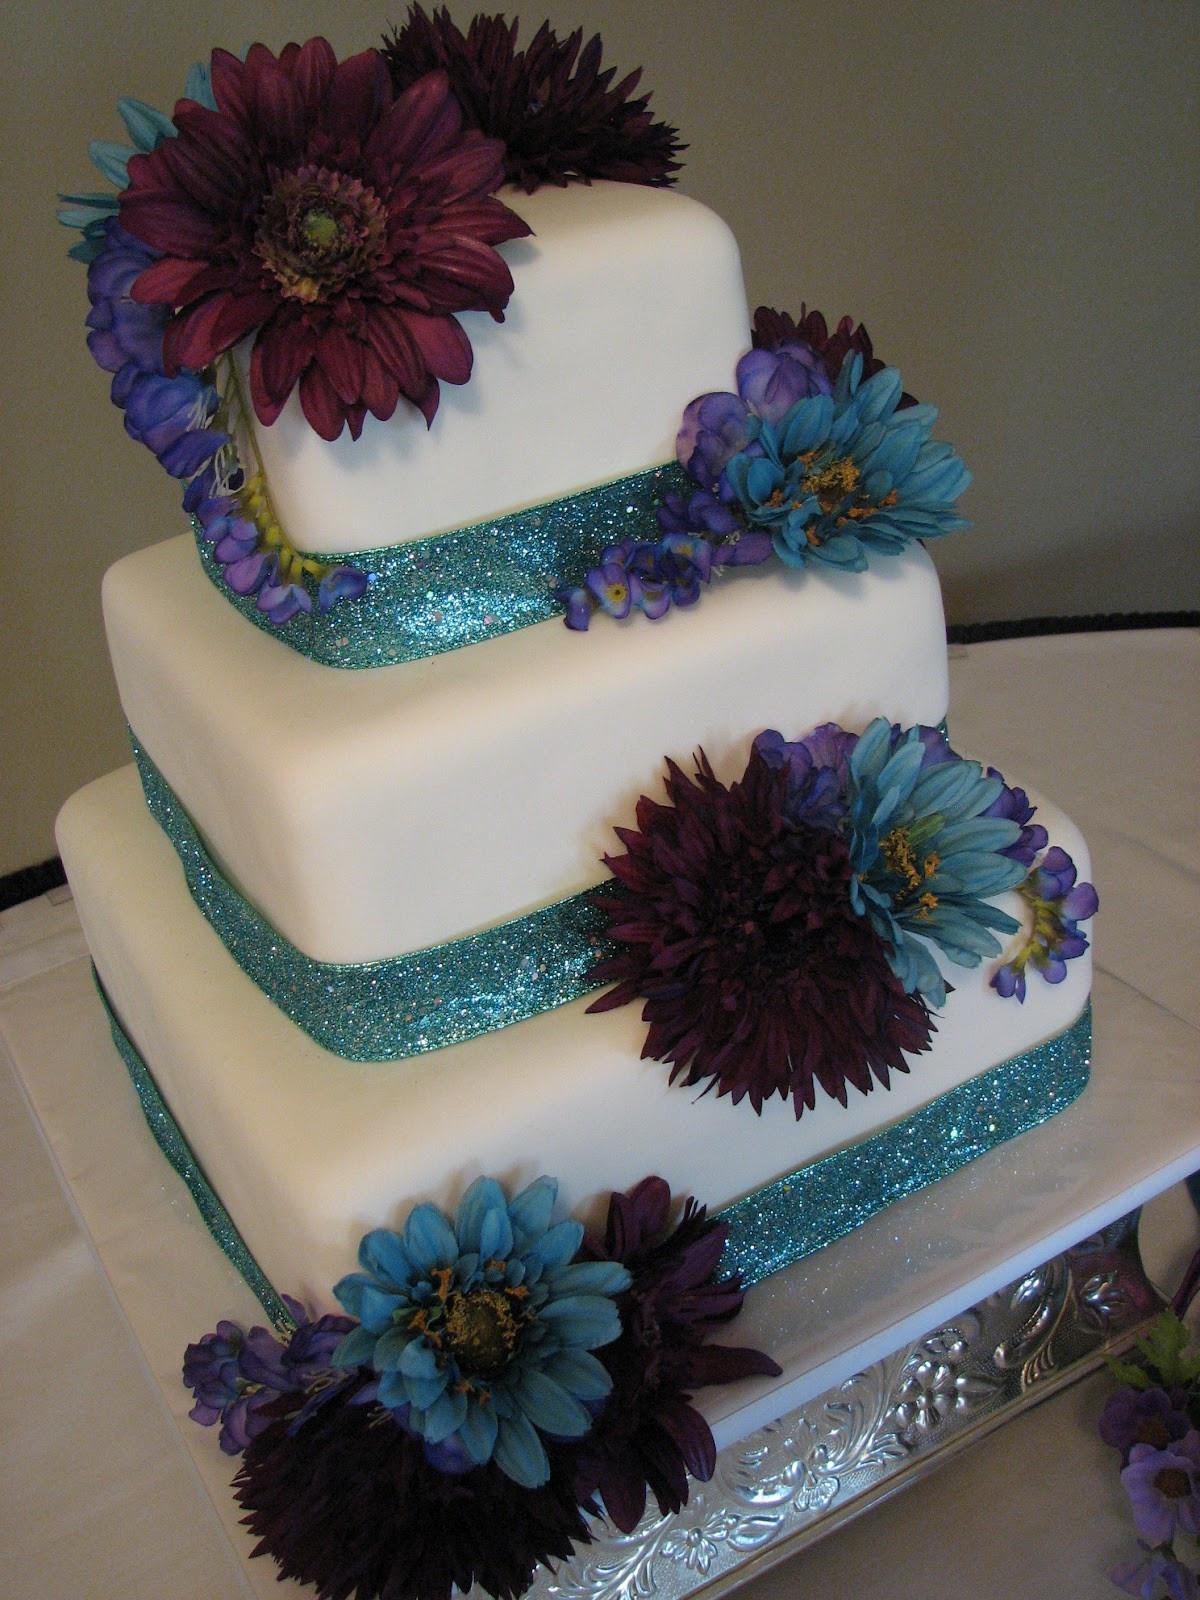 Turquoise And Purple Wedding Cakes  Decadent Designs Brandy s Turquoise and Purple Wedding Cake